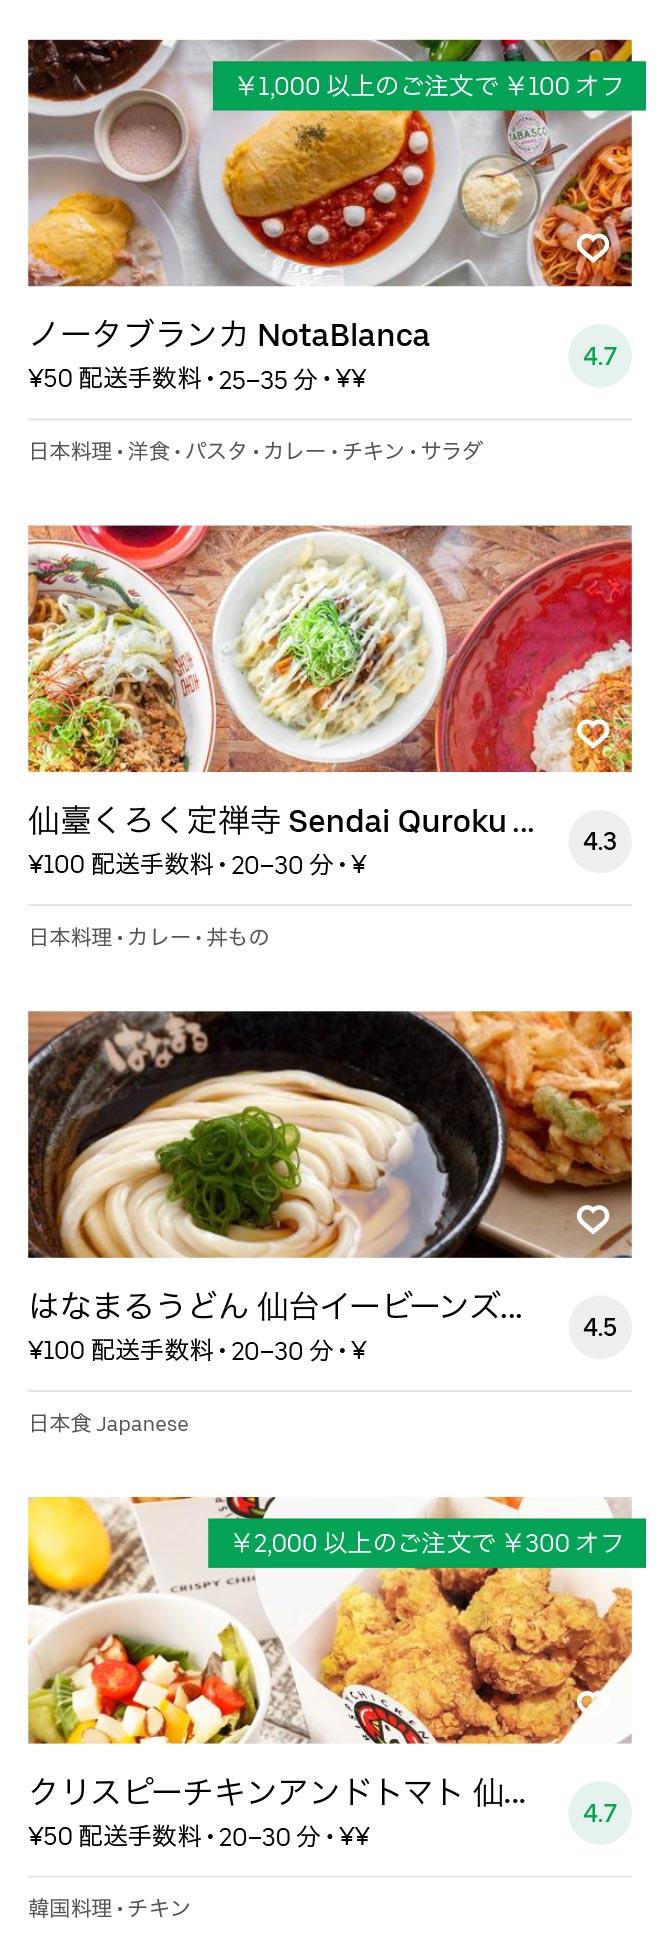 Sendai menu 2008 11